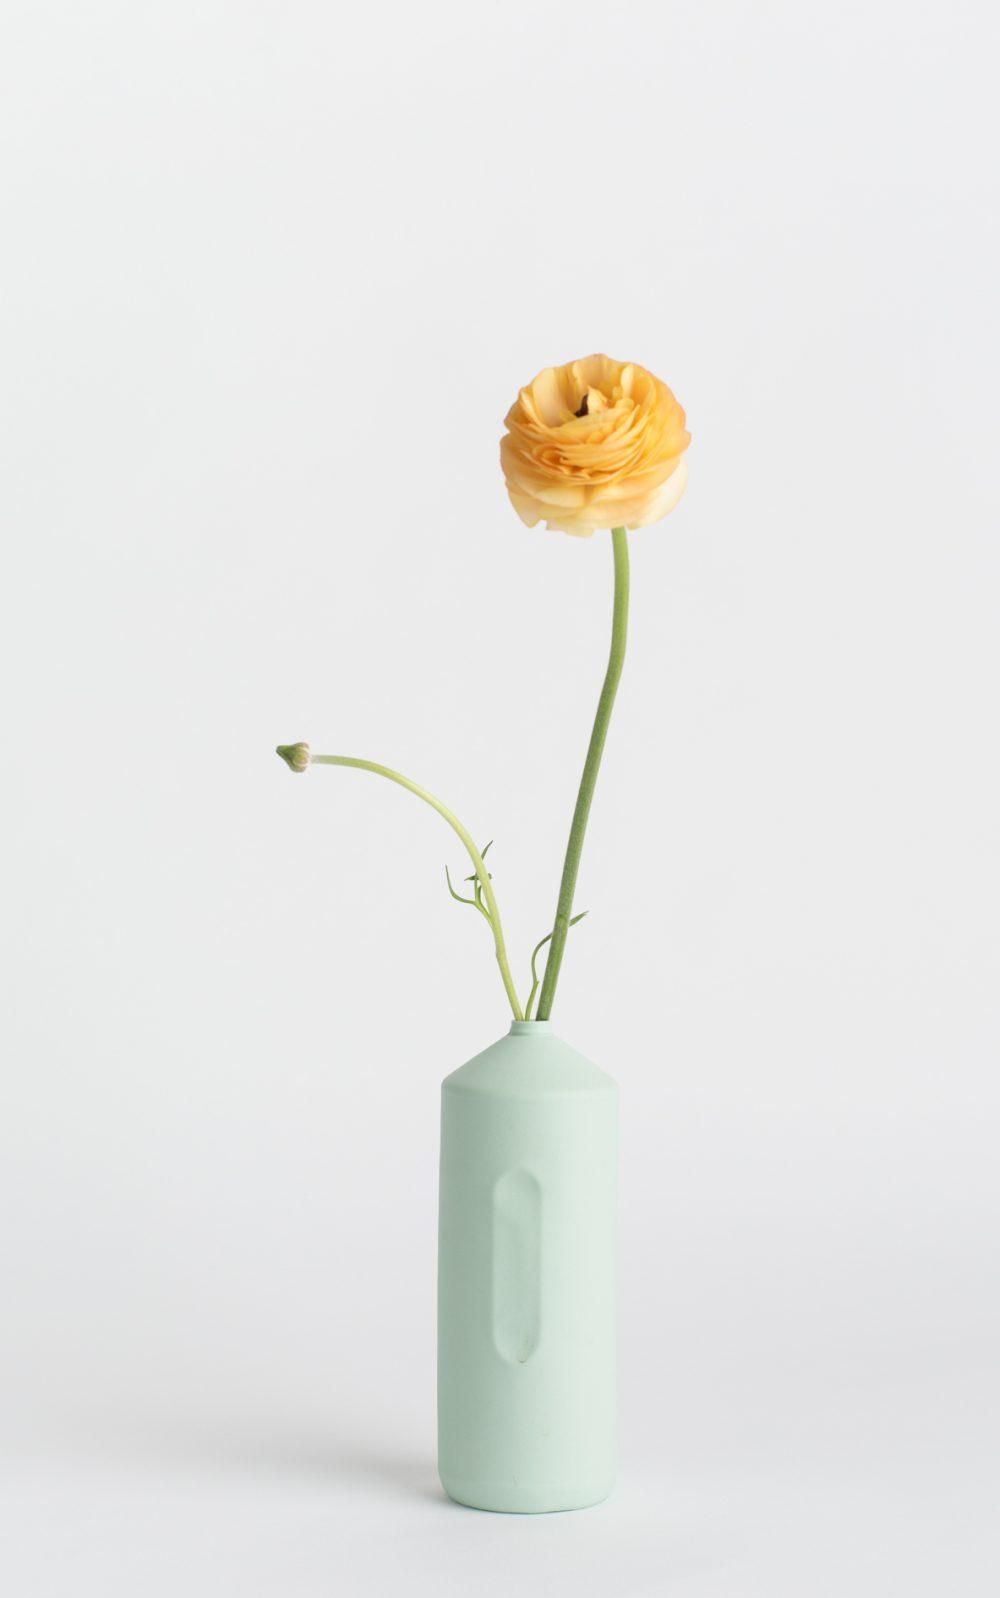 bottle vase #2 mint with flower